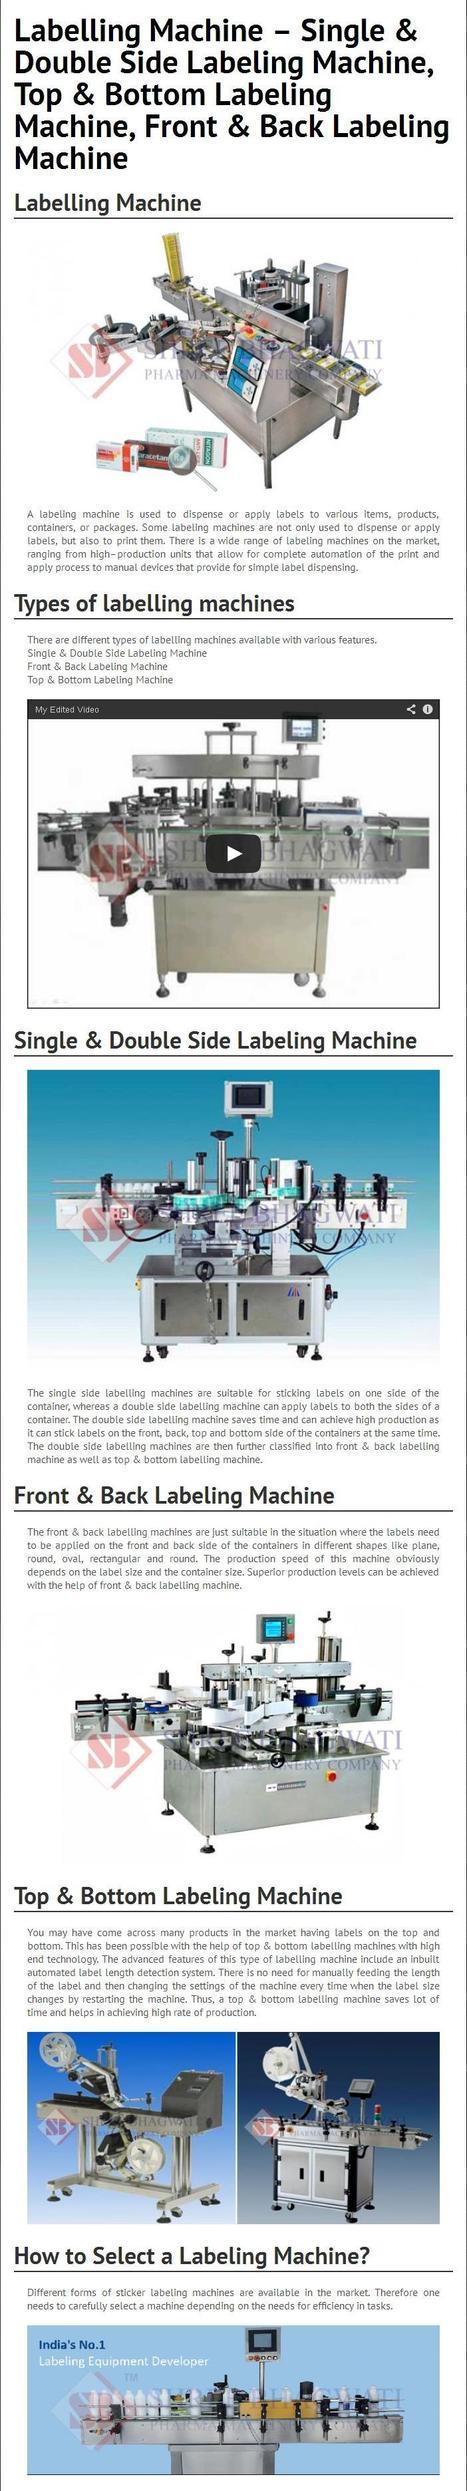 Labelling Machine – Single & Double Side Labeling Machine, Top & Bottom Labeling Machine, Front & Back Labeling Machine | Shree Bhagwati Labelling Technologies | Scoop.it